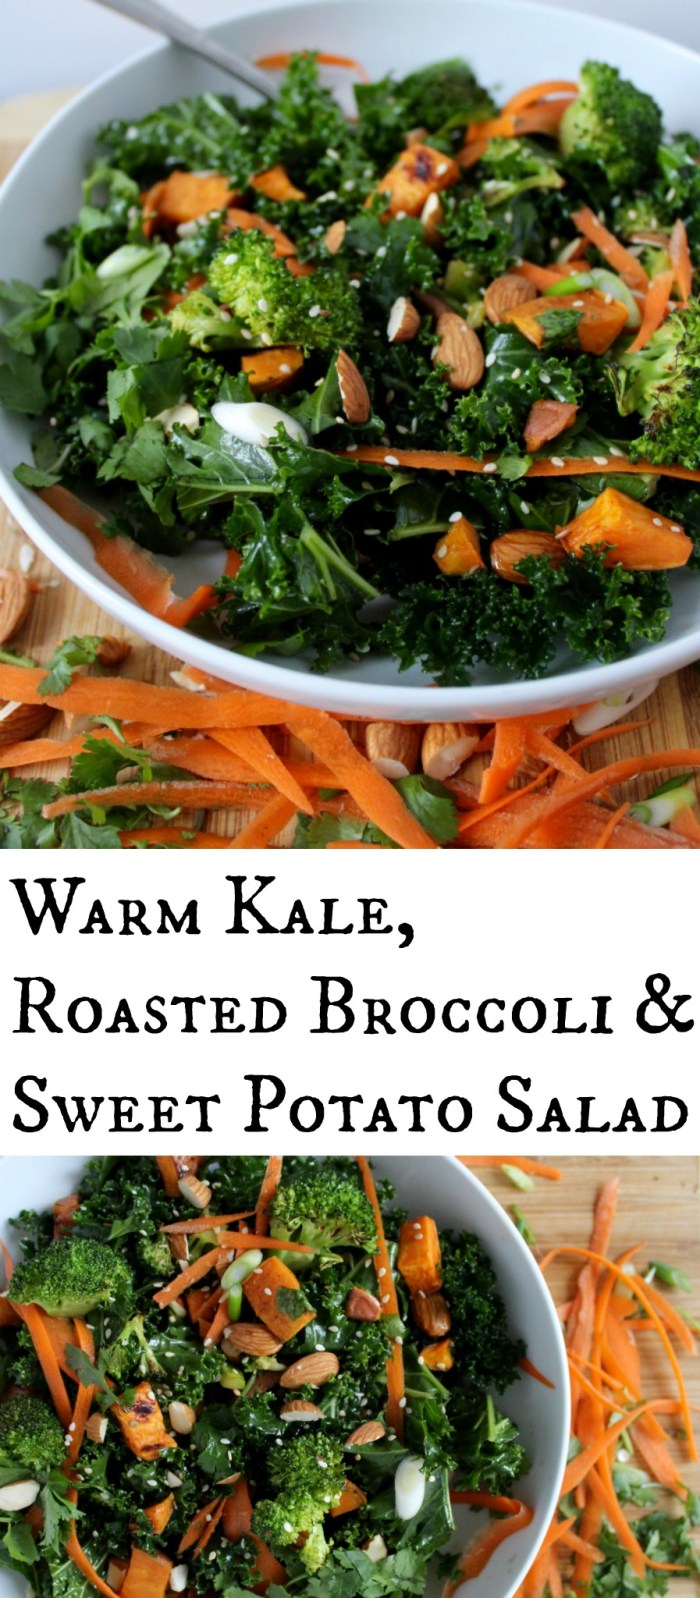 Warm Kale, Roasted Broccoli and Sweet Potato Salad with Sesame Vinaigrette. So good and healthy!!